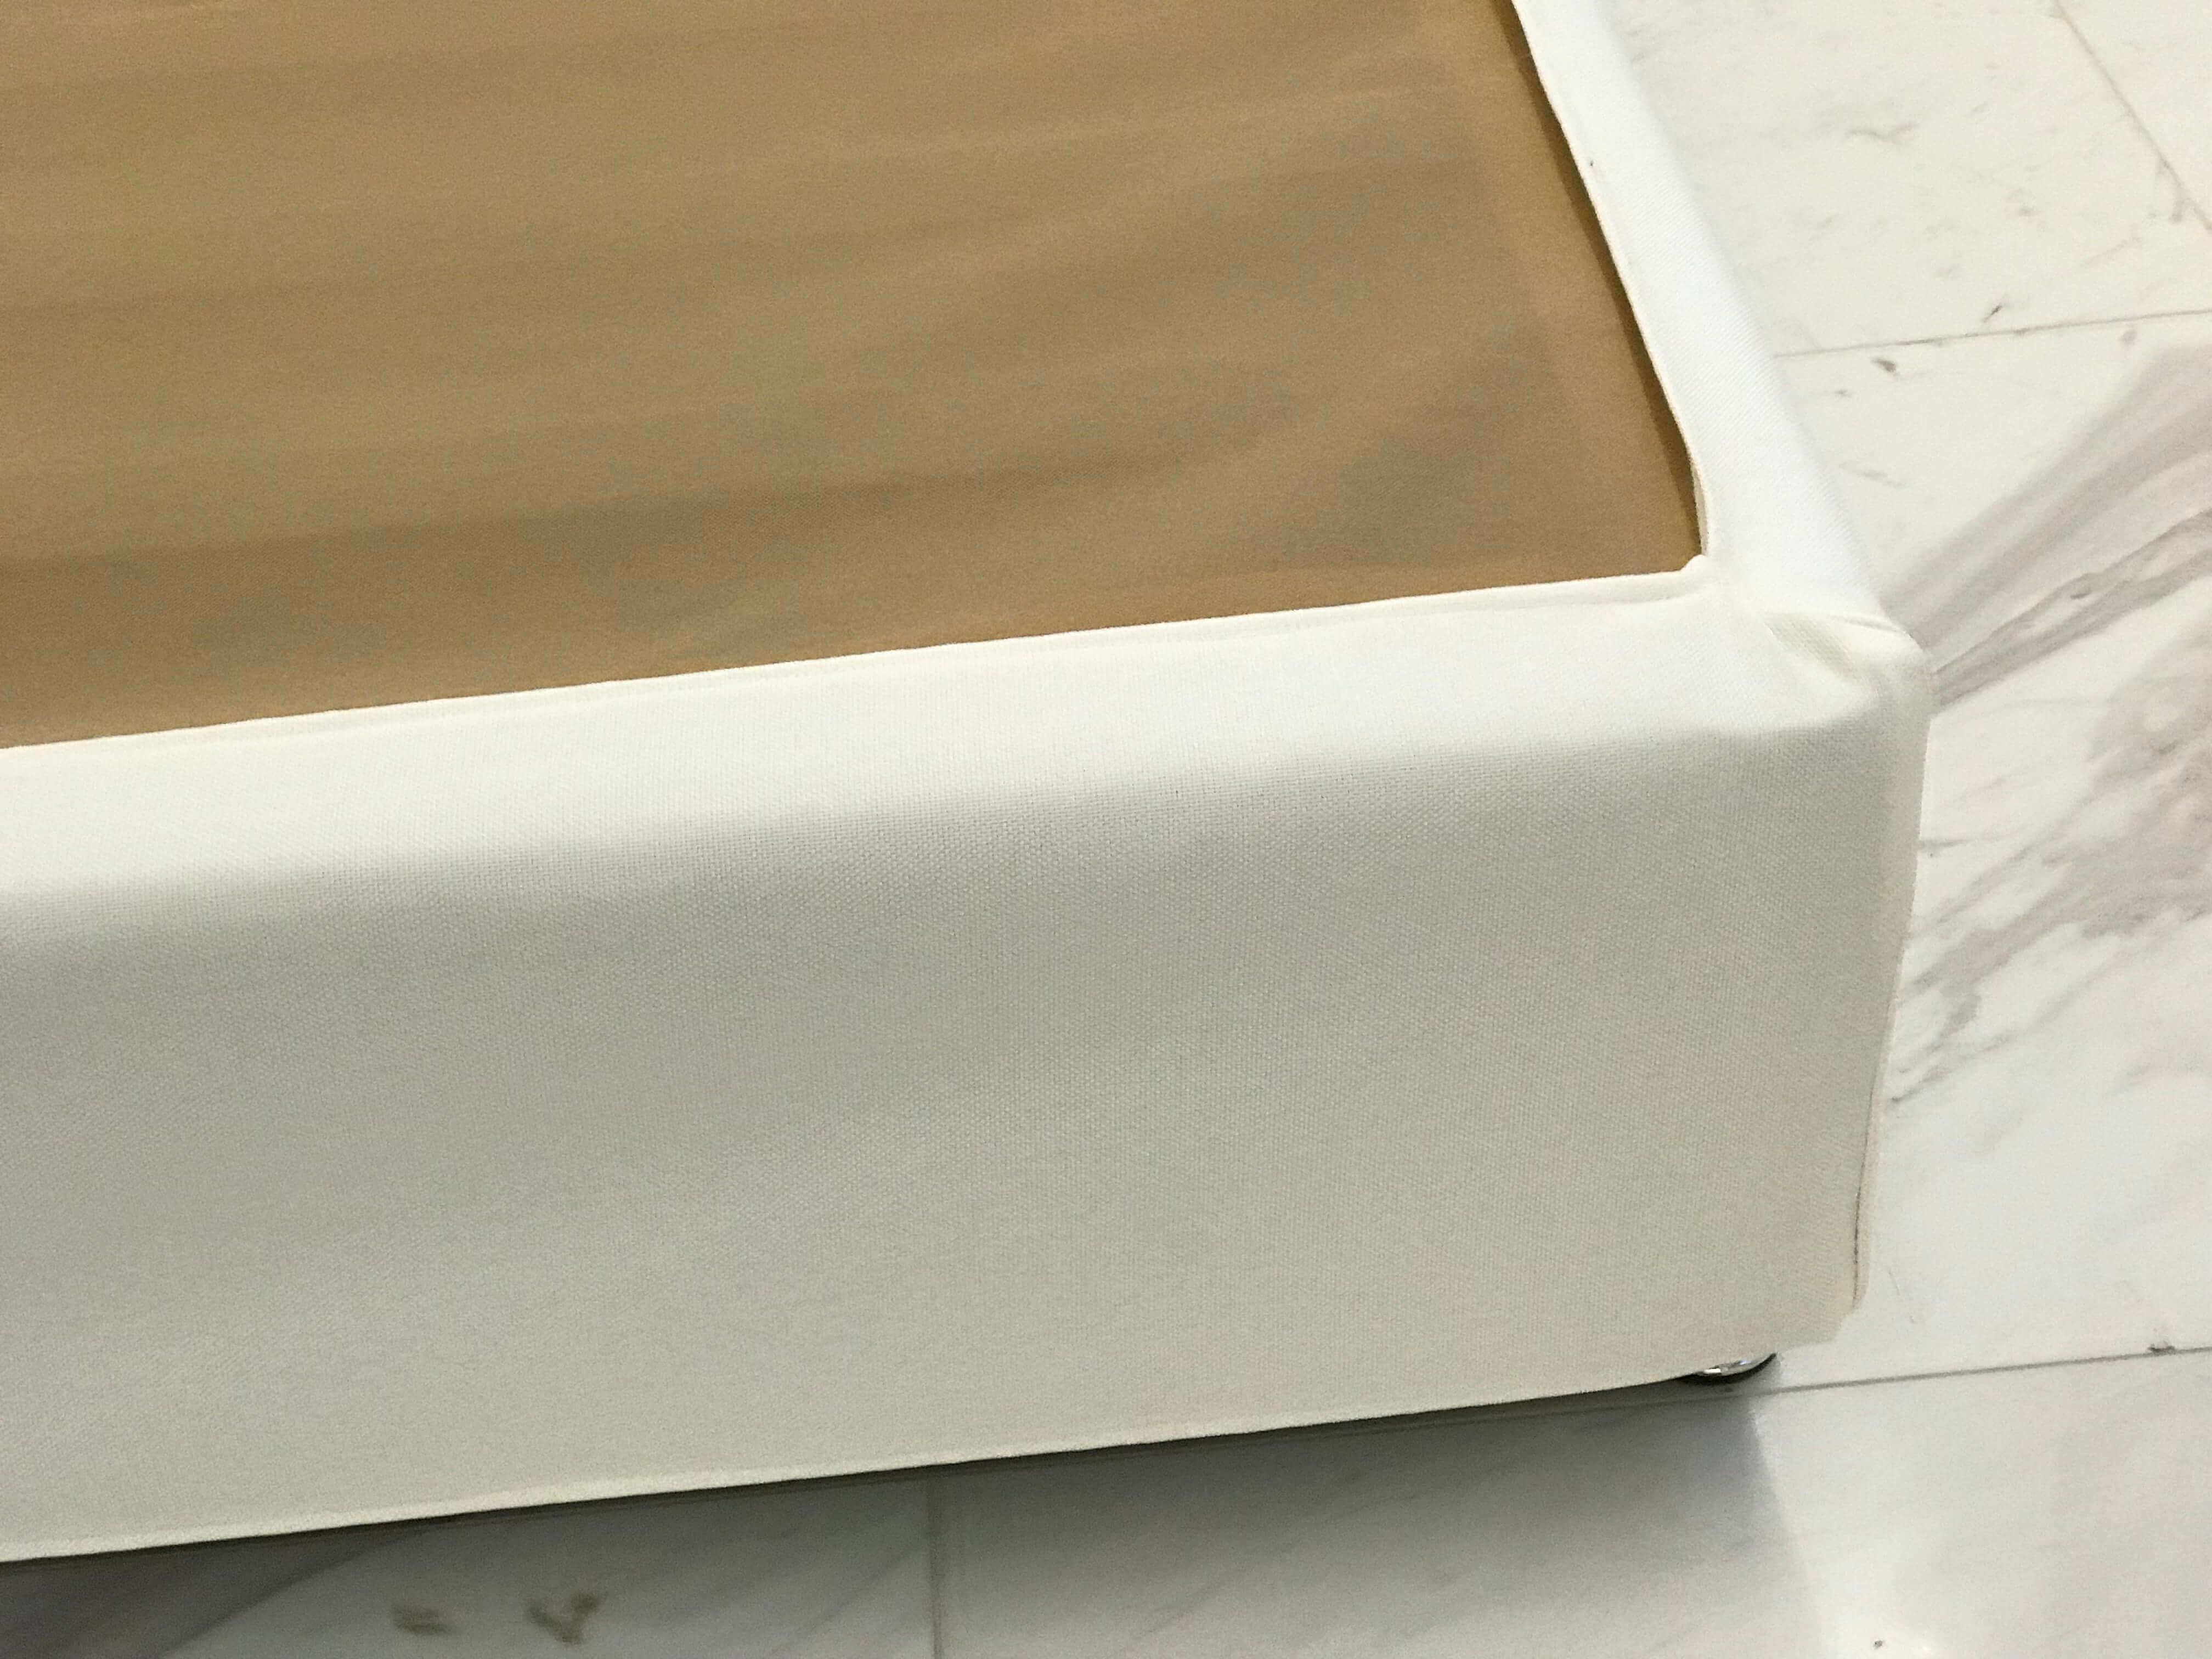 Bedbase Wrap Beds Ahead Pty Ltd